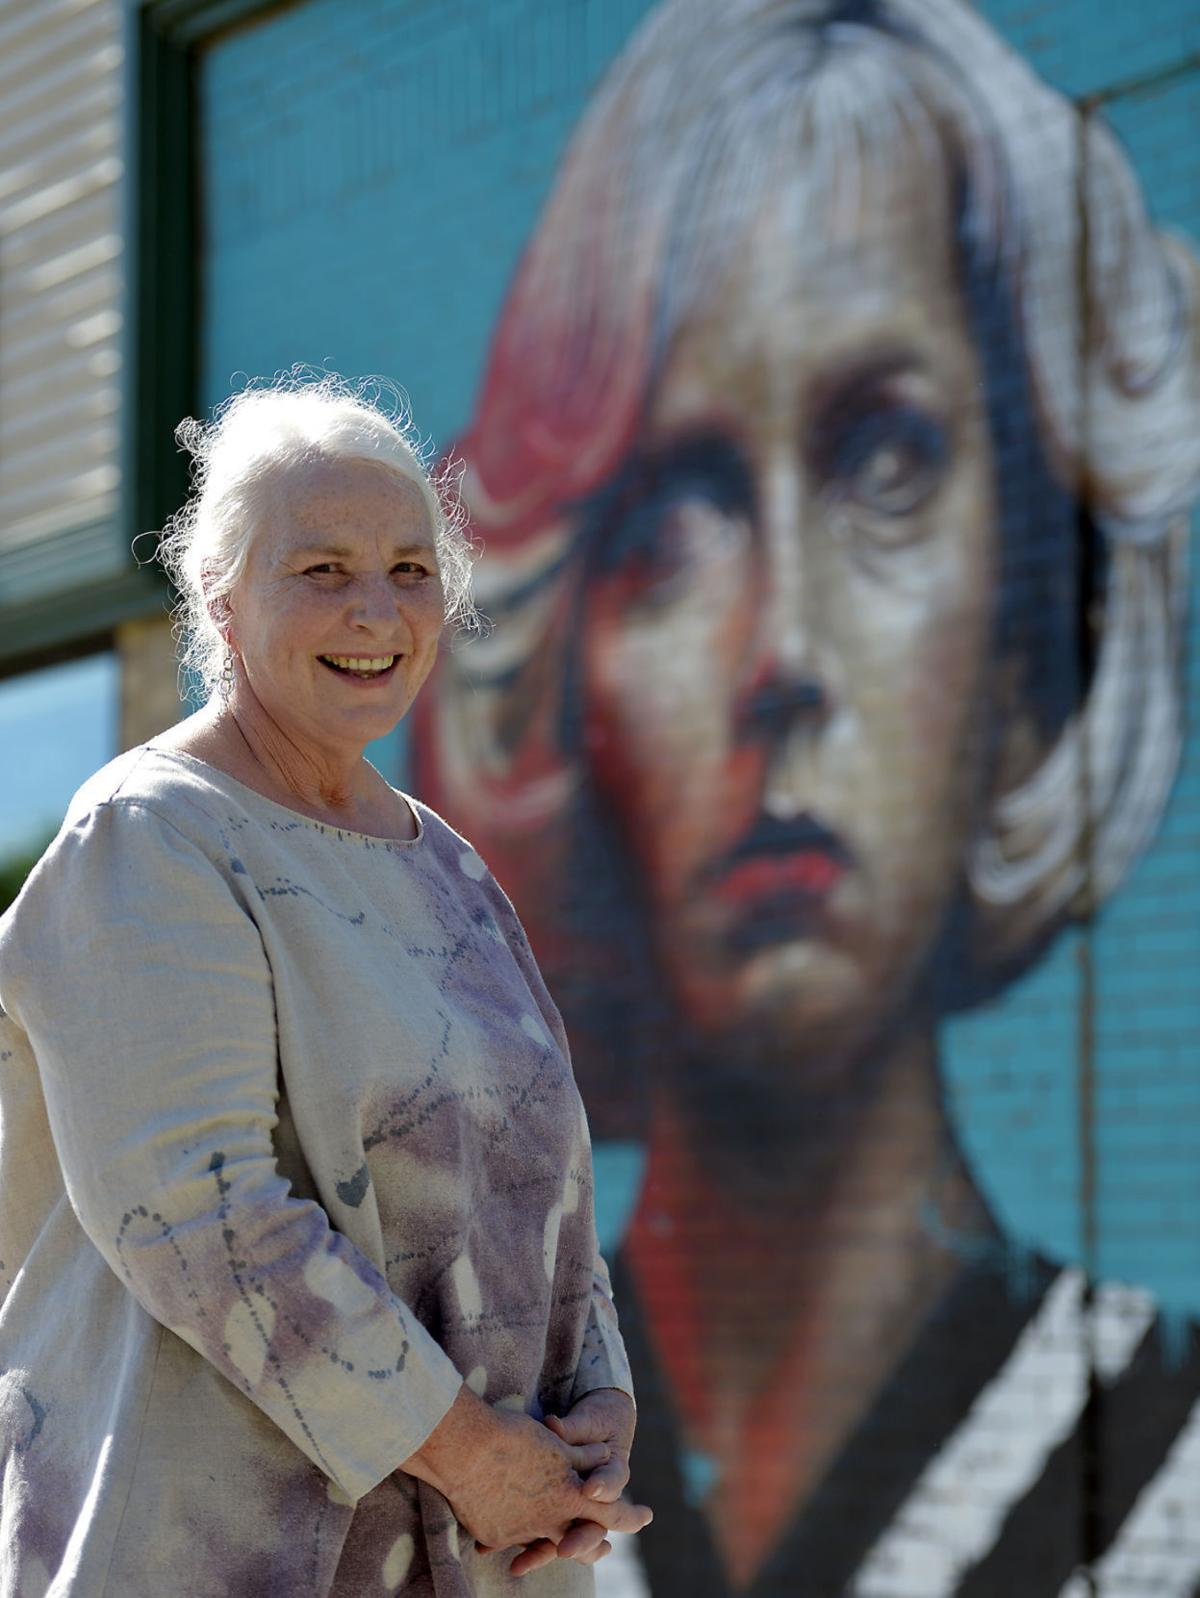 Marjorie Meyer of Re Vision Gallery